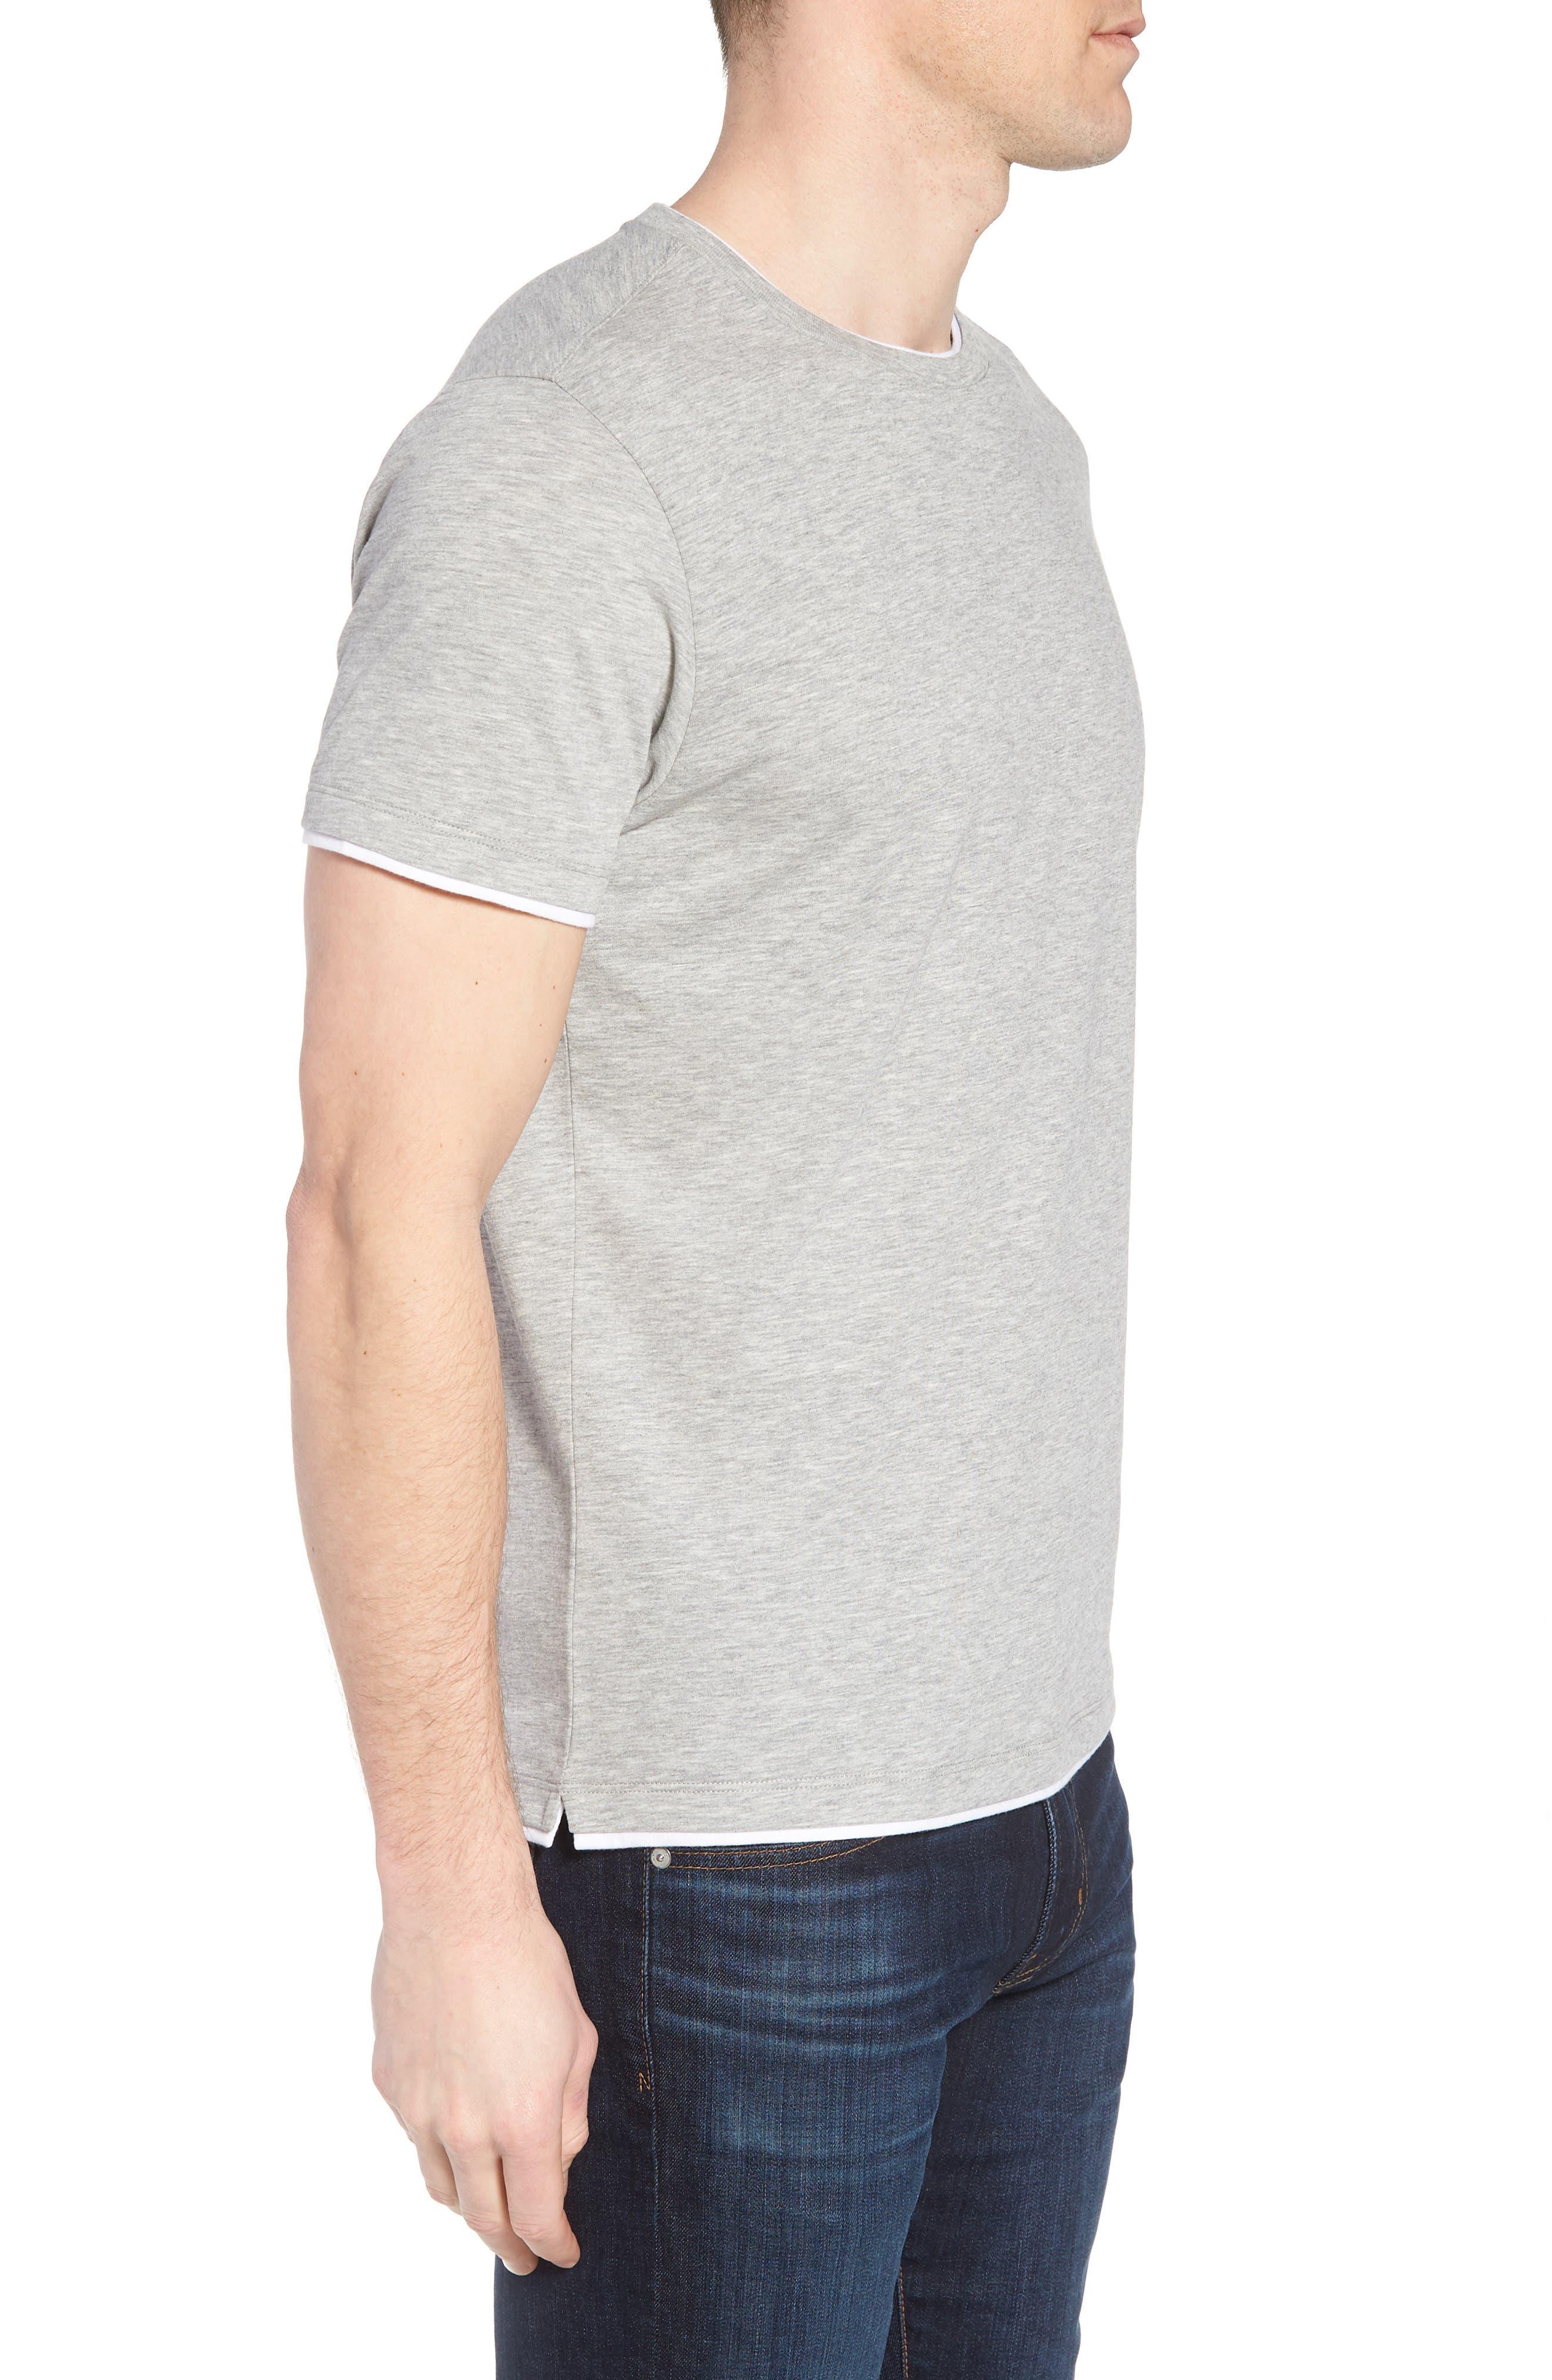 Halifax Crewneck T-Shirt,                             Alternate thumbnail 3, color,                             Light Grey